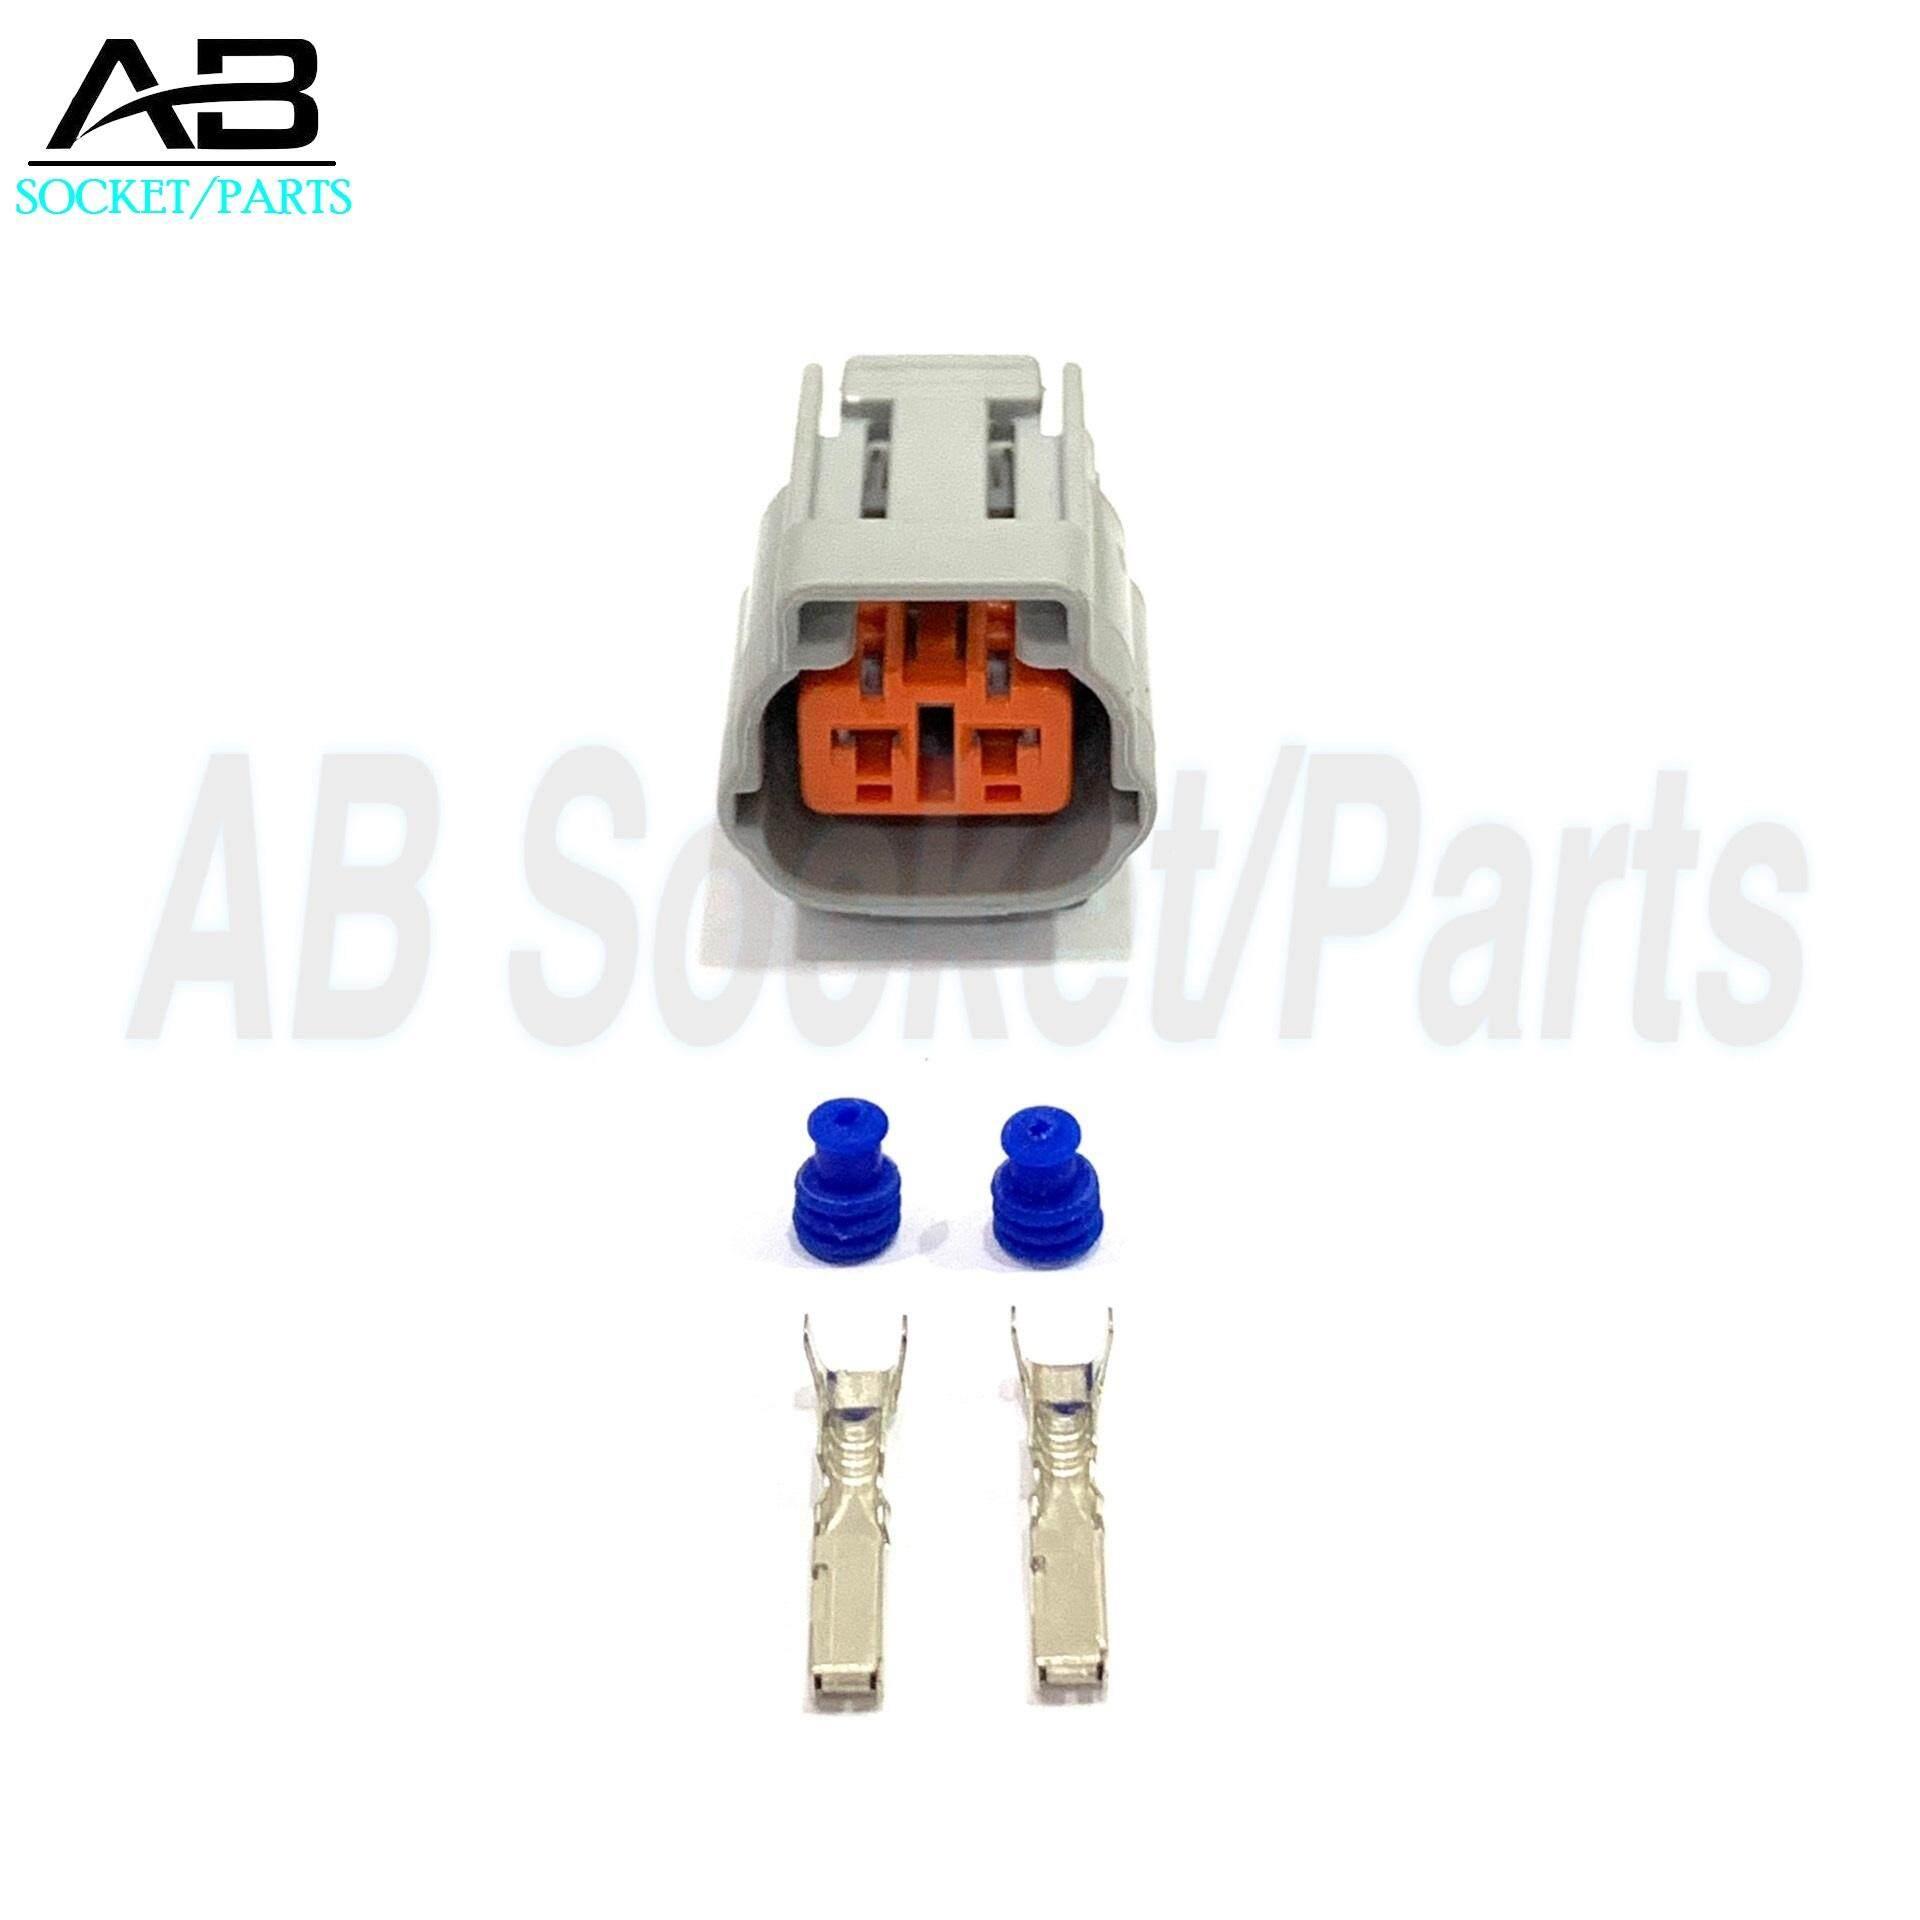 2 Pin Proton Wira 1 3 1 5 MMC Fuel Pump Socket Connector